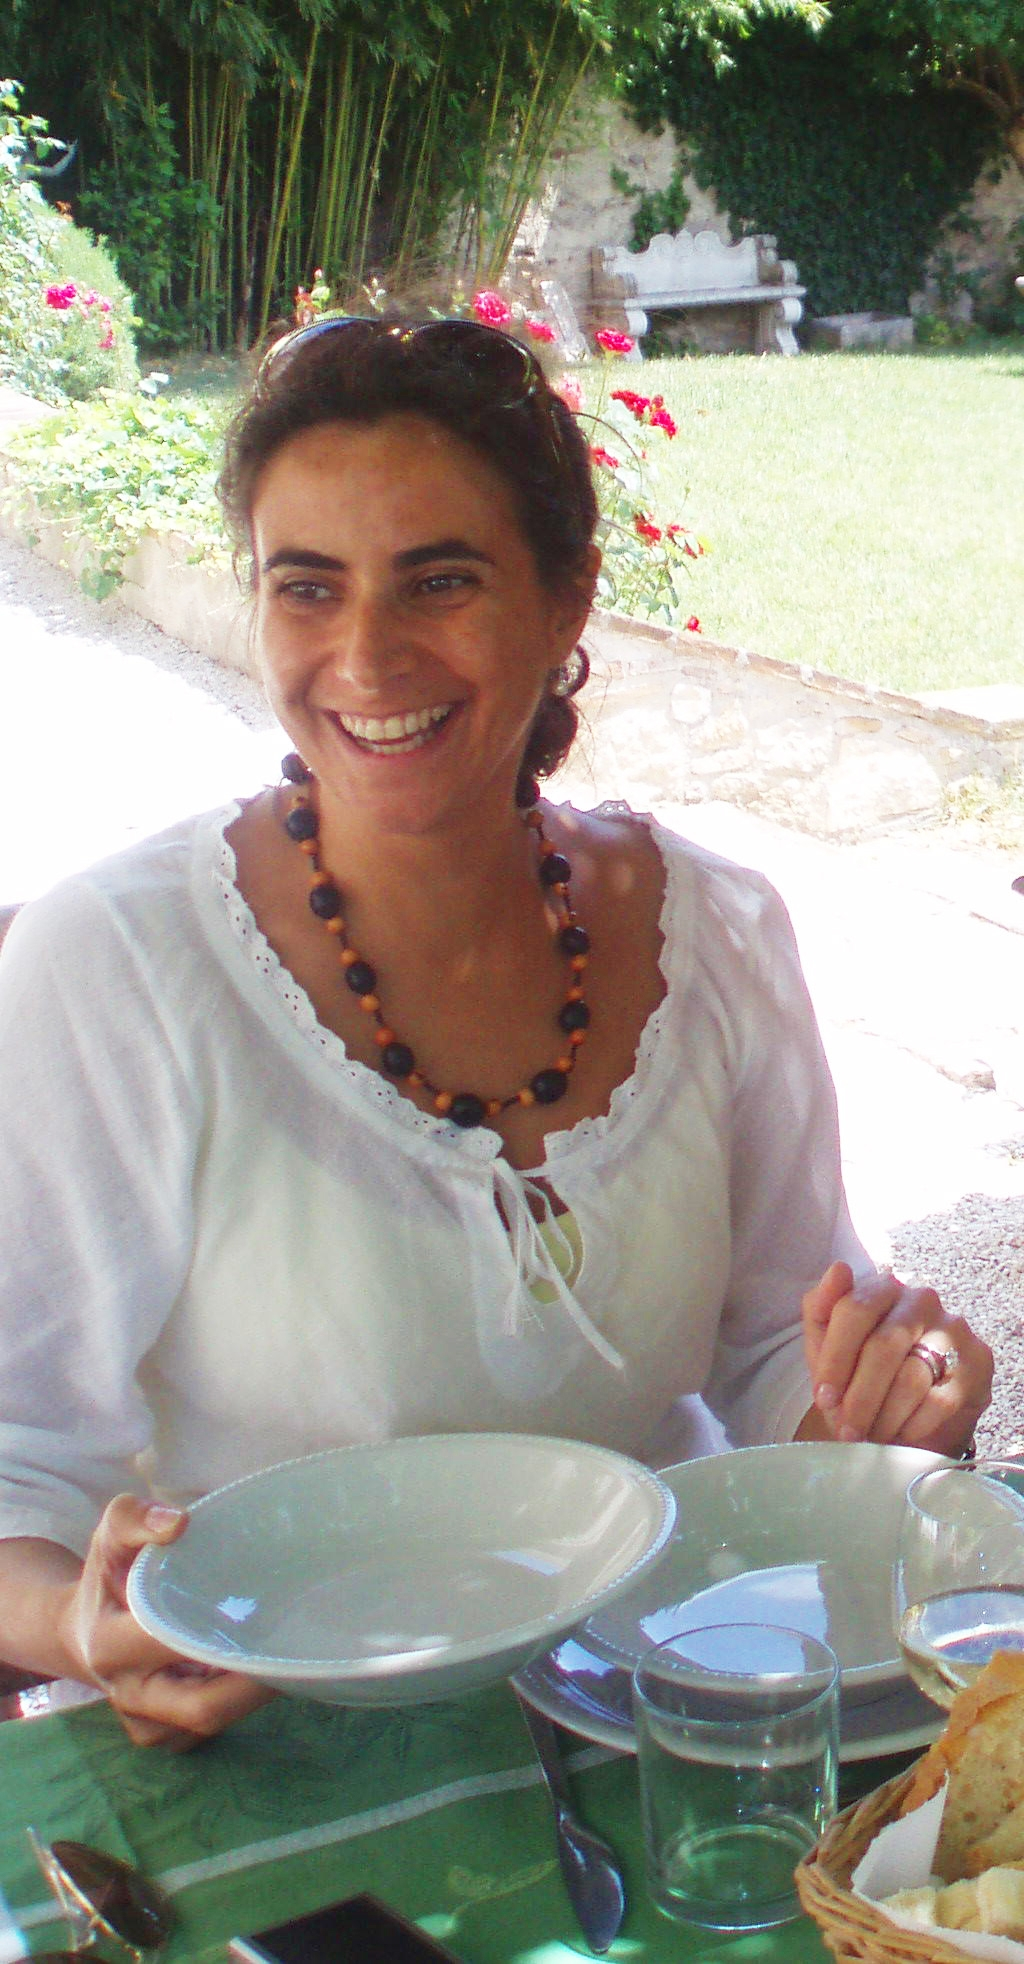 Silvia Nacamulli at Relais dei Ciclamini